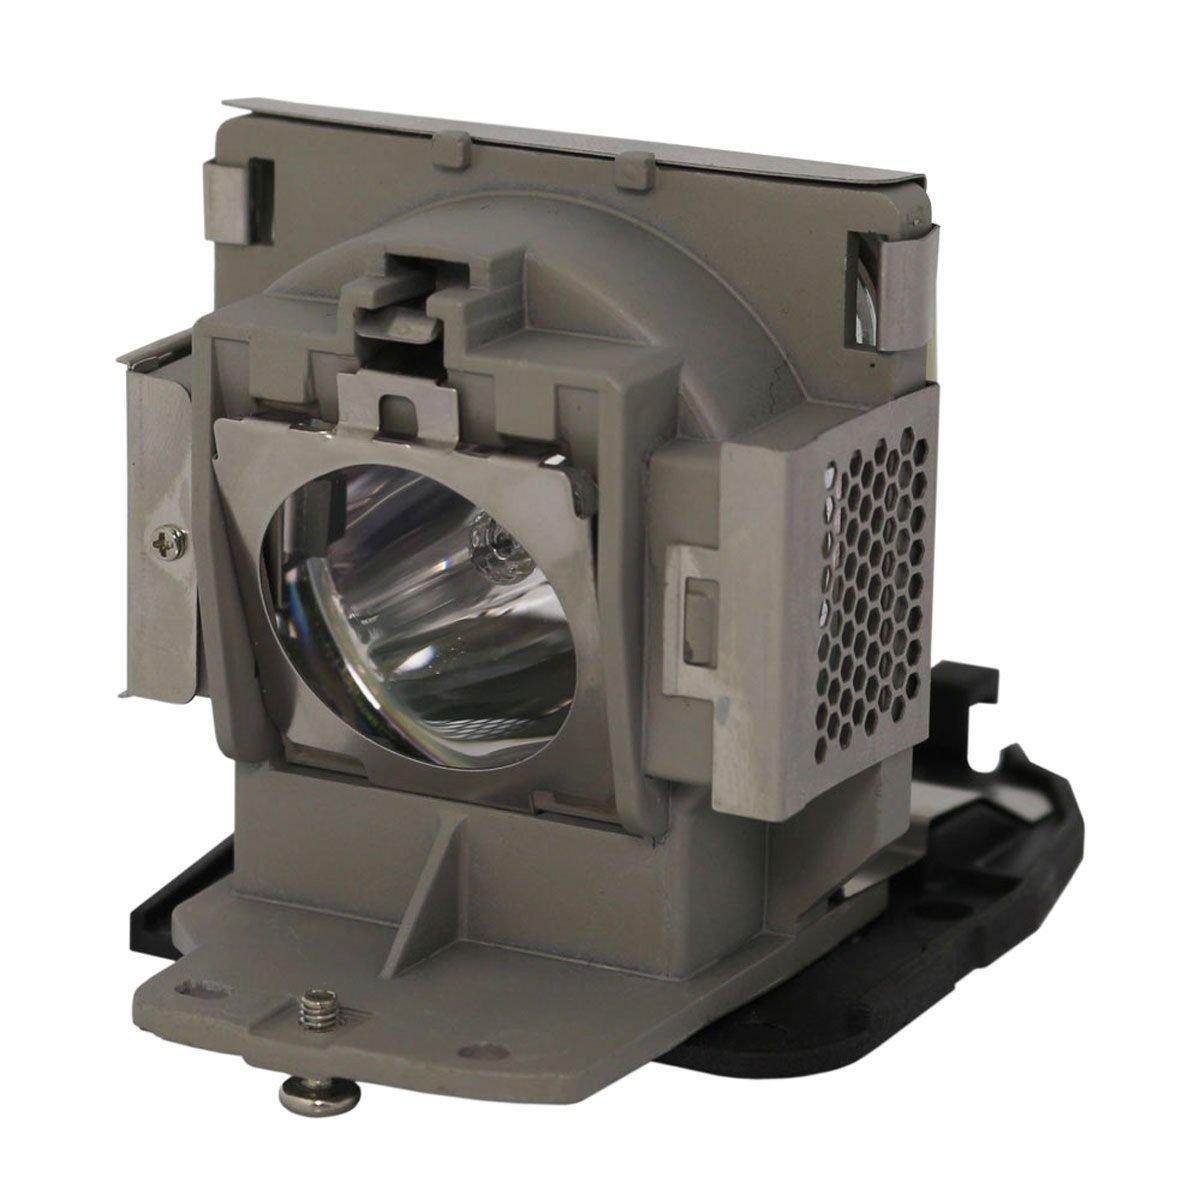 Amazing Lamps 5j.06 W01.001工場元電球で互換性ハウジングfor BenQプロジェクタ   B078GBS9TW